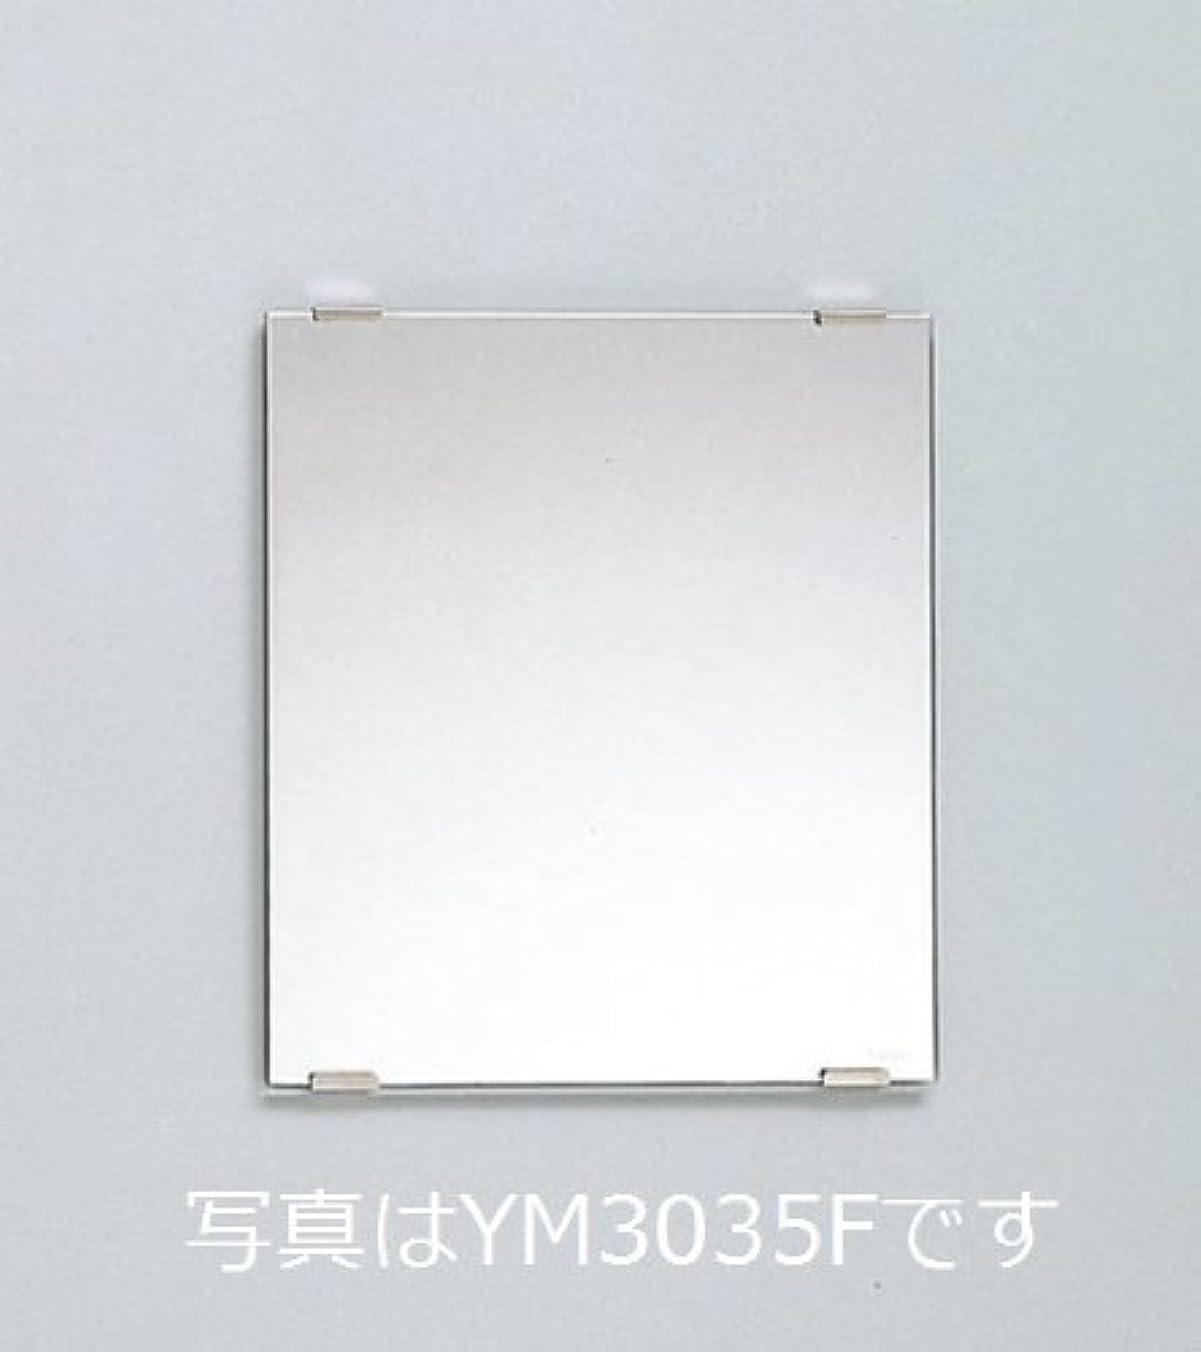 選ぶ維持代表TOTO 化粧鏡 YM6075F 耐食鏡 角型 600×750(mm)